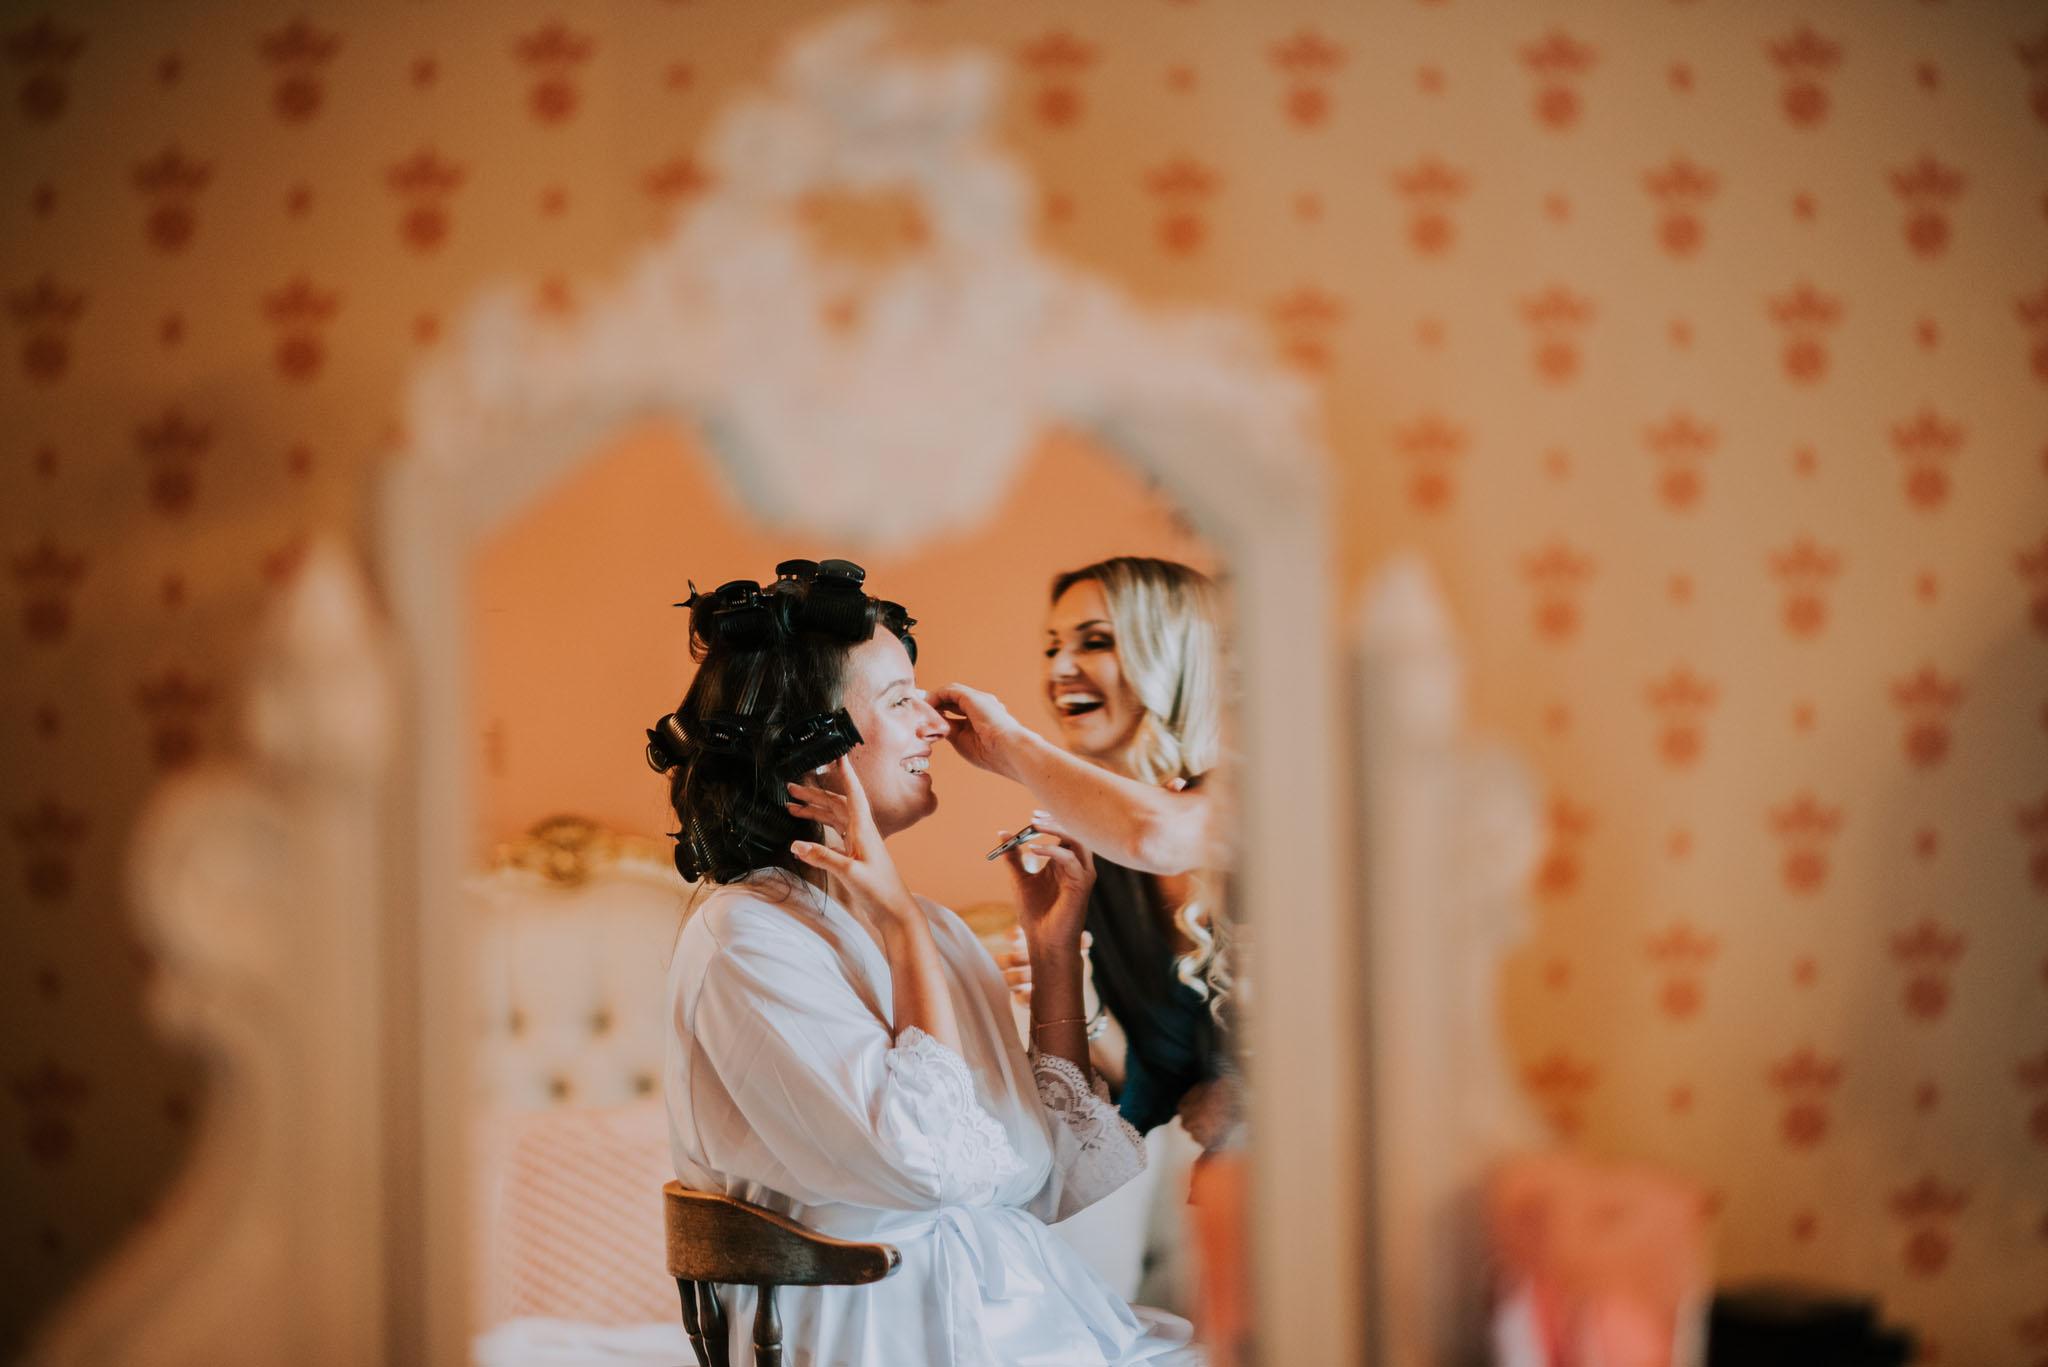 wedding-photographer-glewstone-court-hereford-scott-stockwell-photography076.jpg